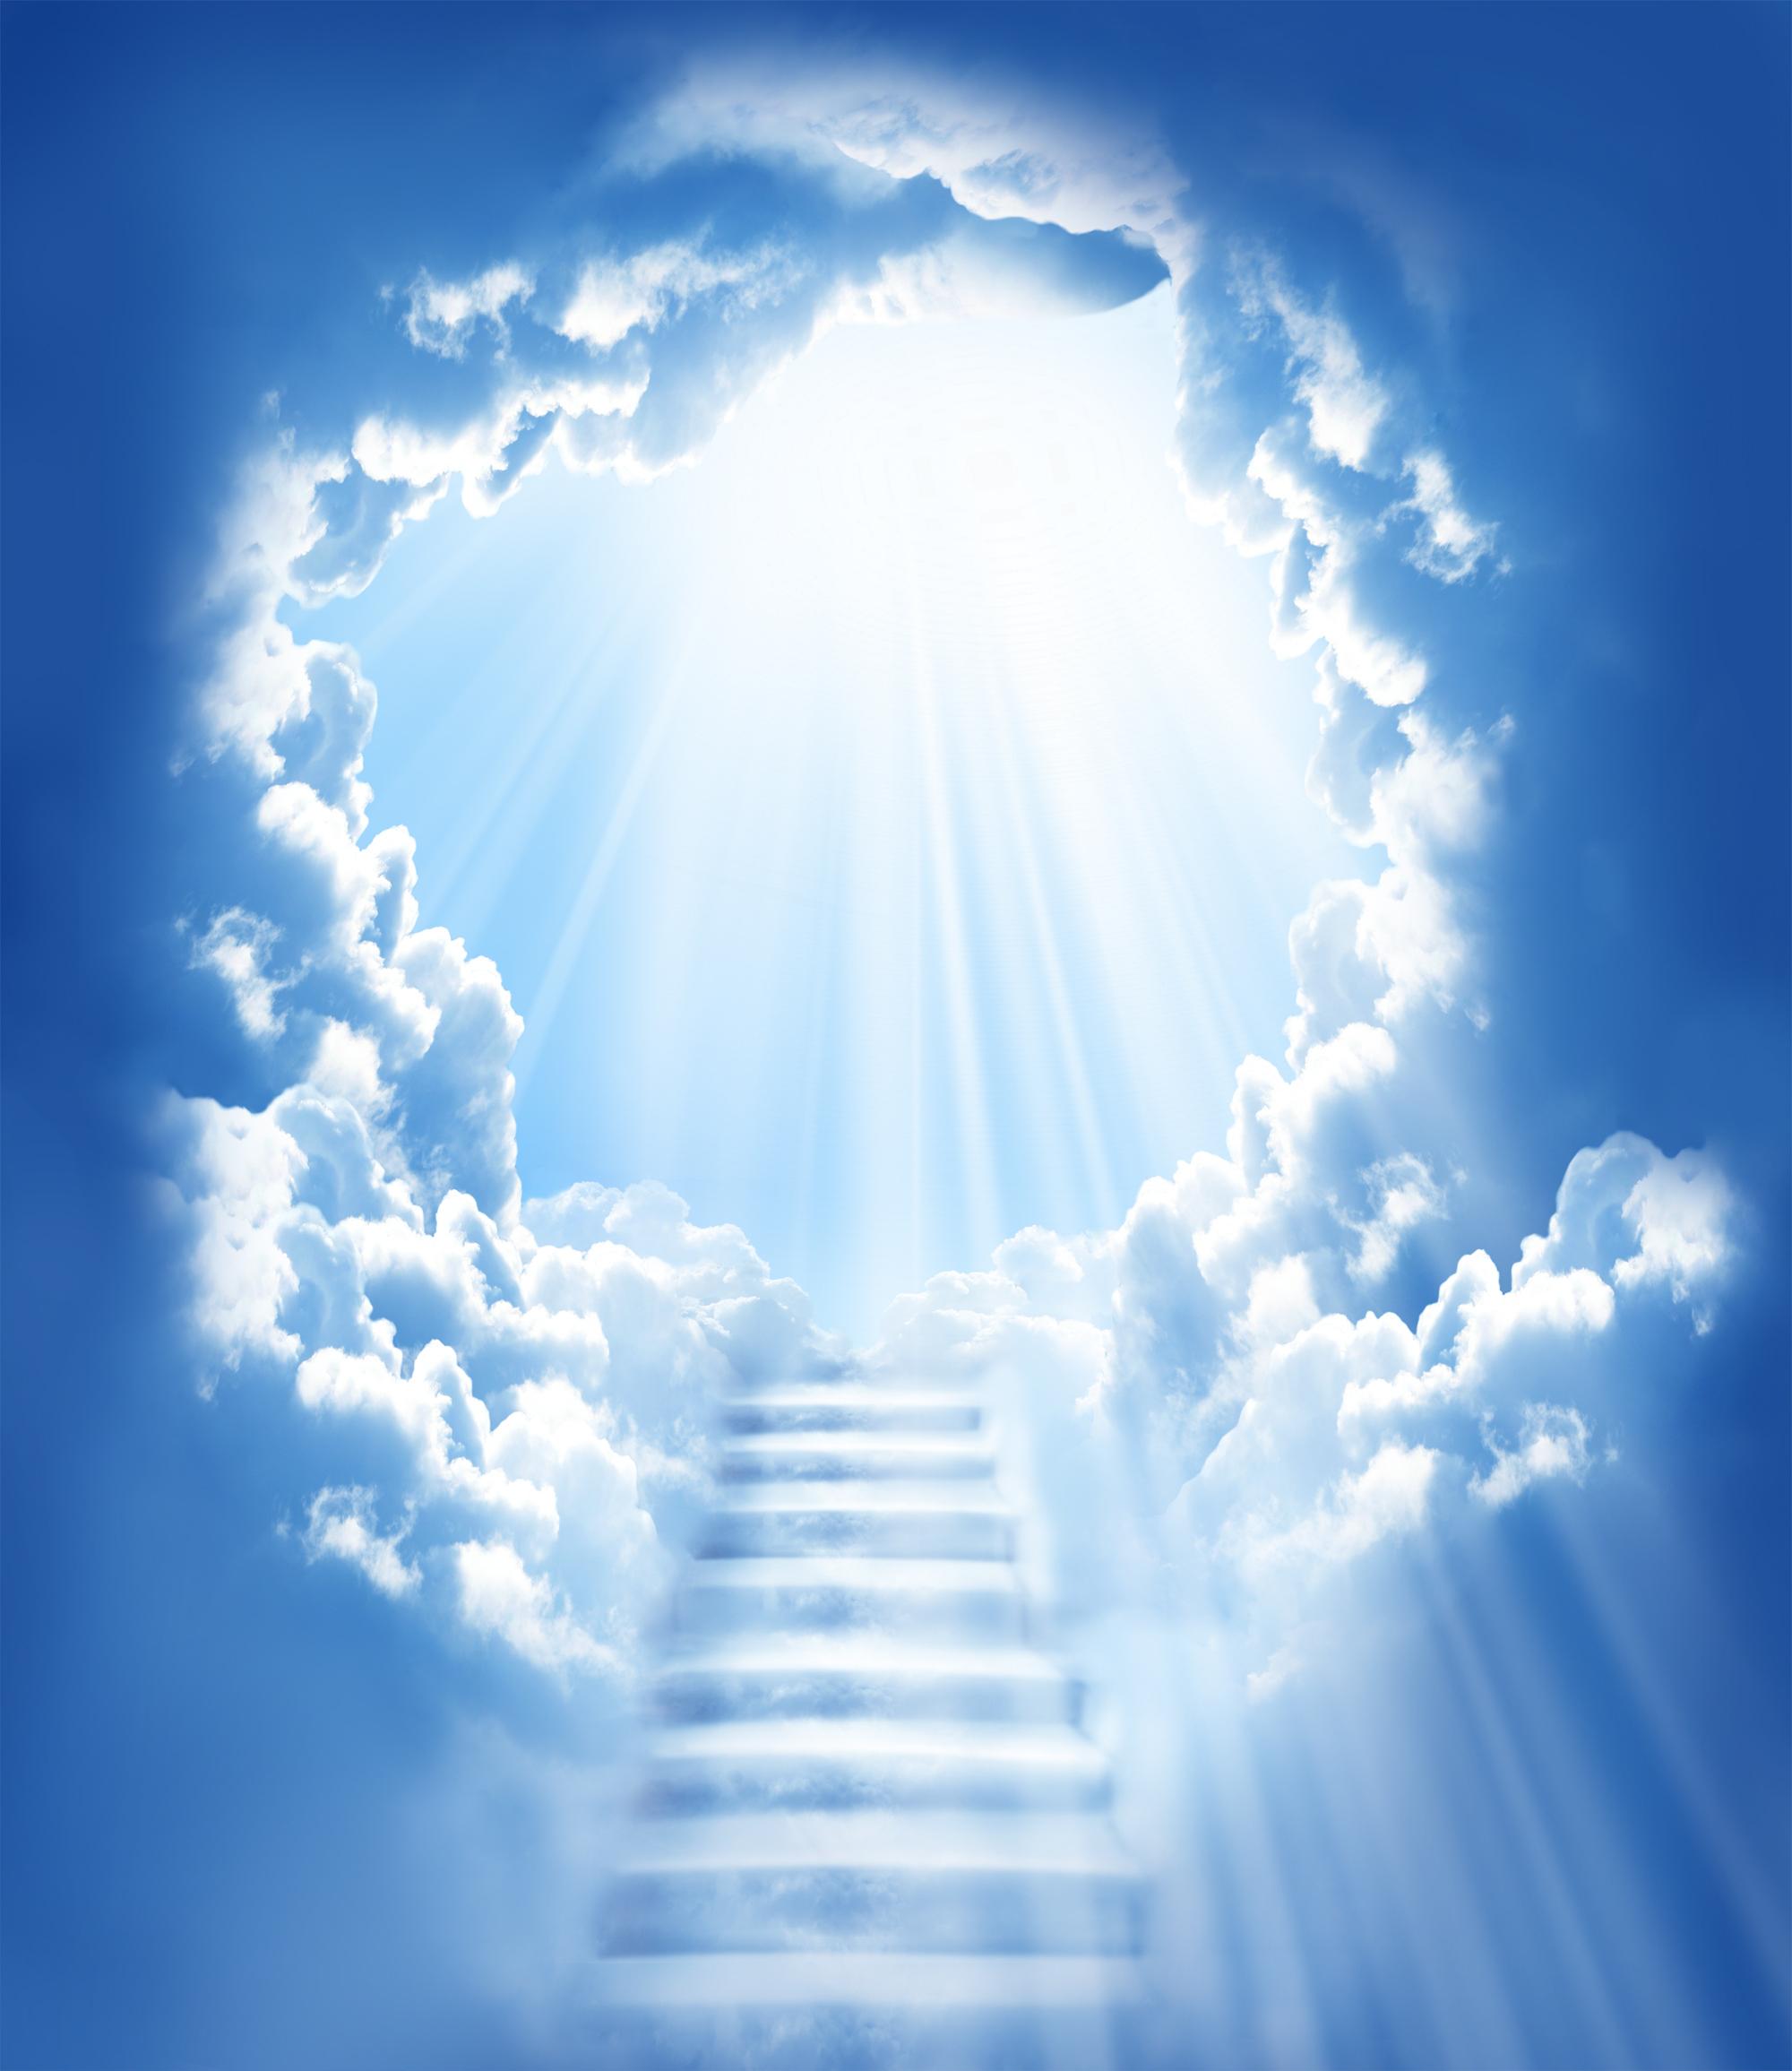 Heaven clipart islam Angel Heavens Up In In